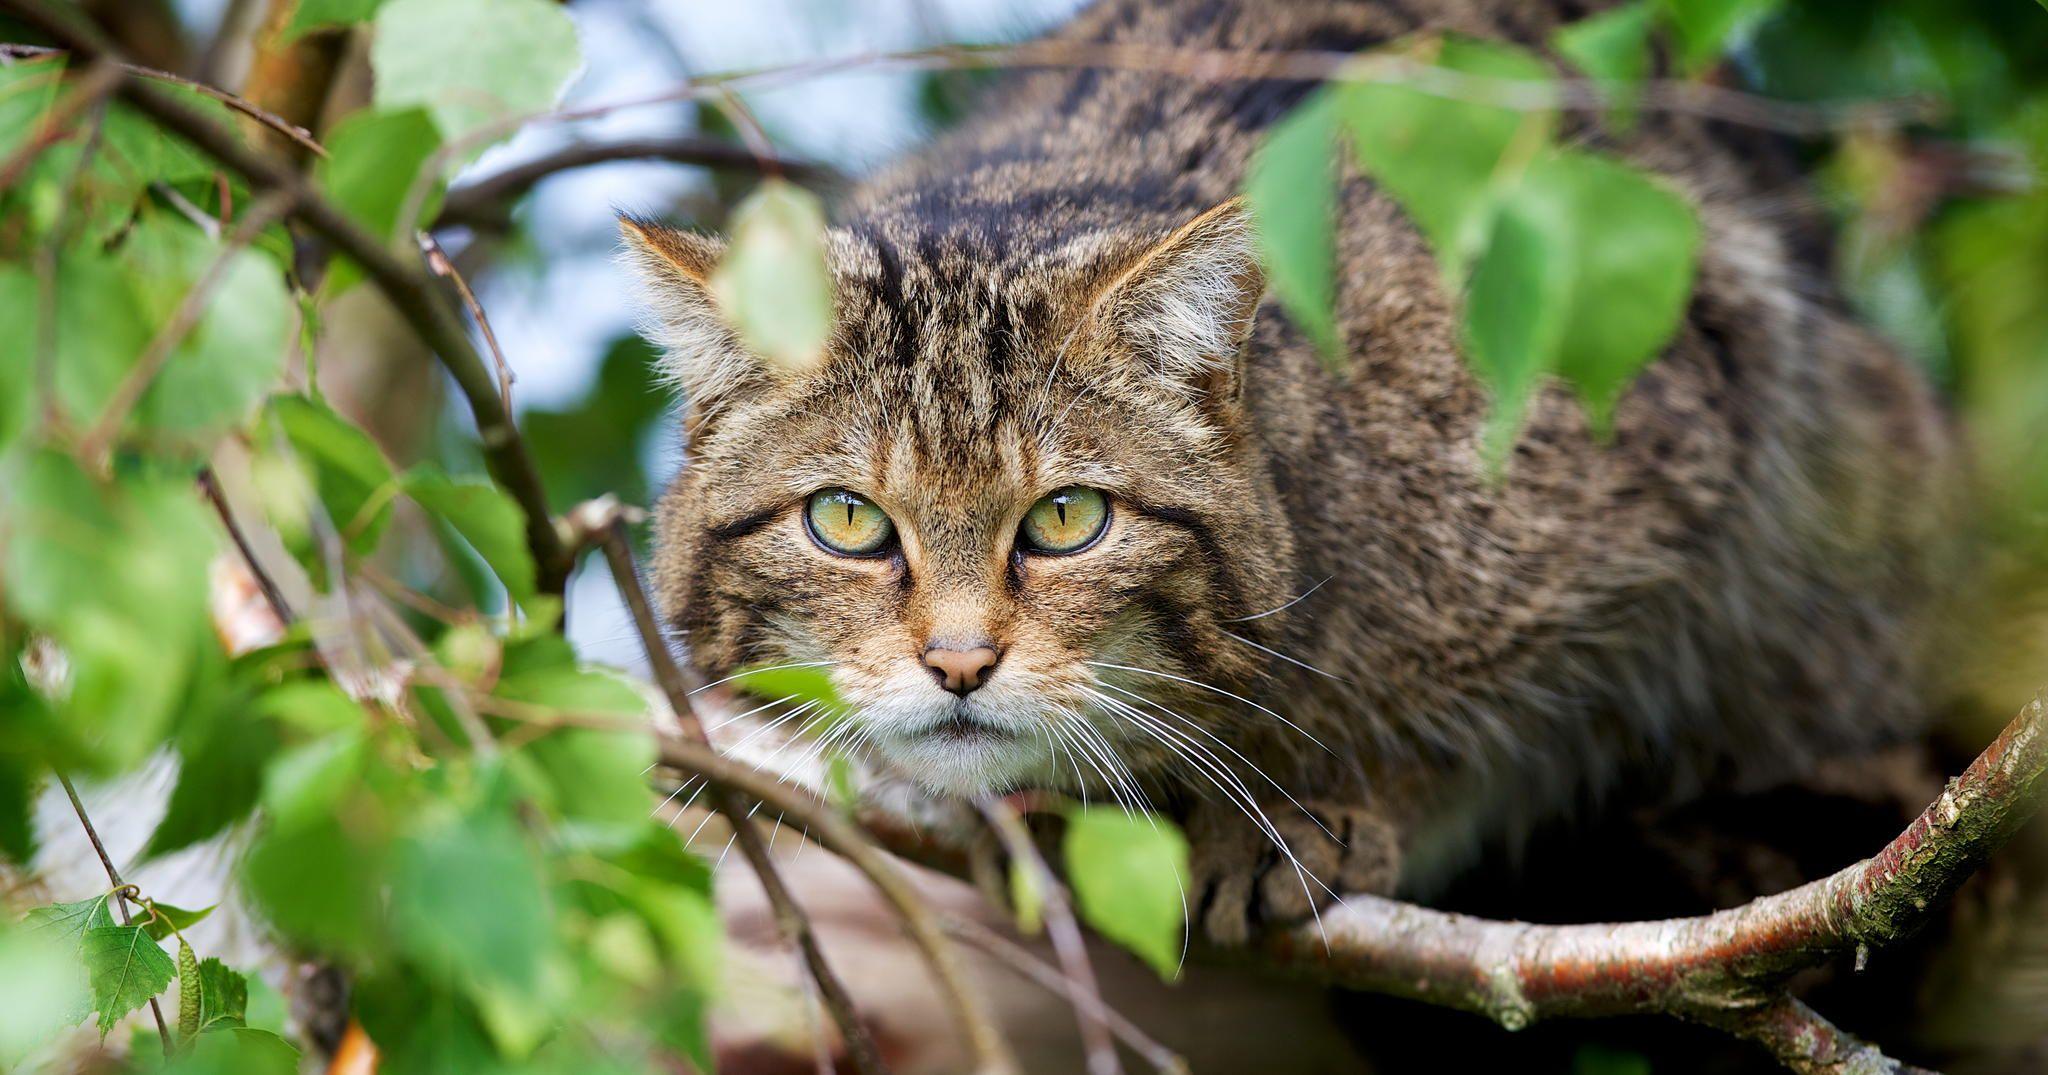 Photograph Scottish Wildcat by Mark Bridger on 500px